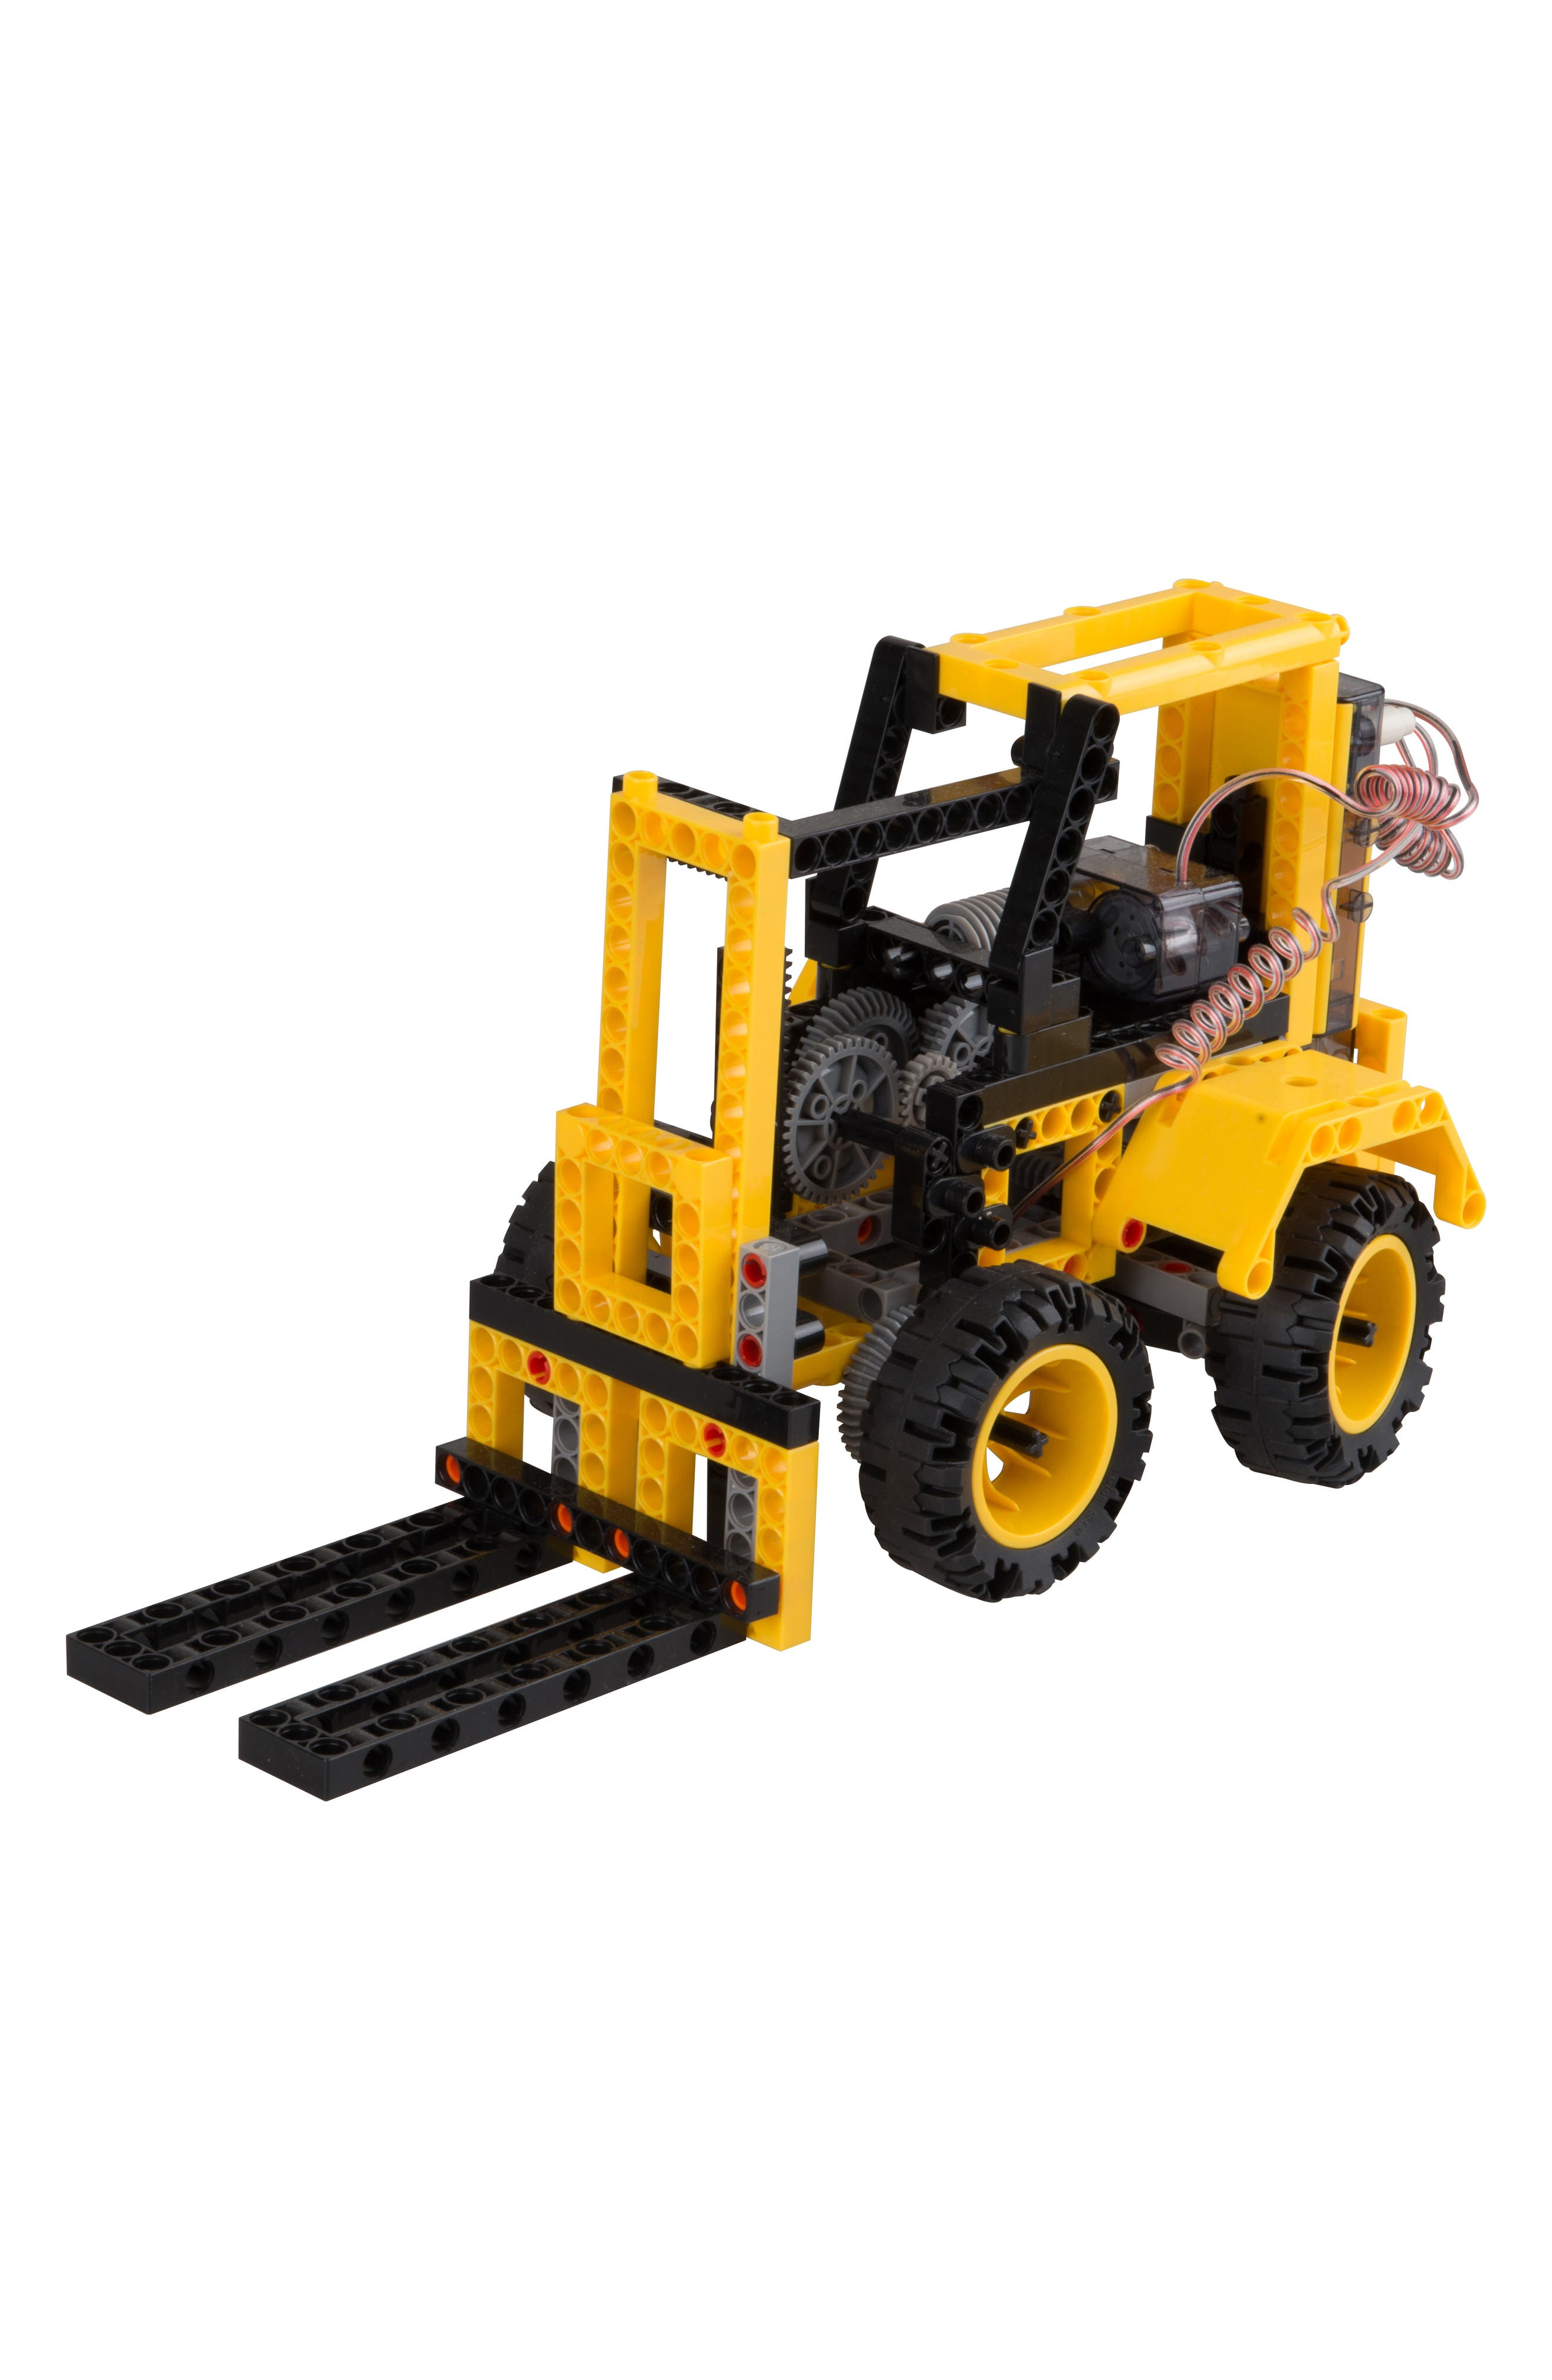 Remote Control Machines Construction Vehicles Kit,                             Alternate thumbnail 8, color,                             MULTI